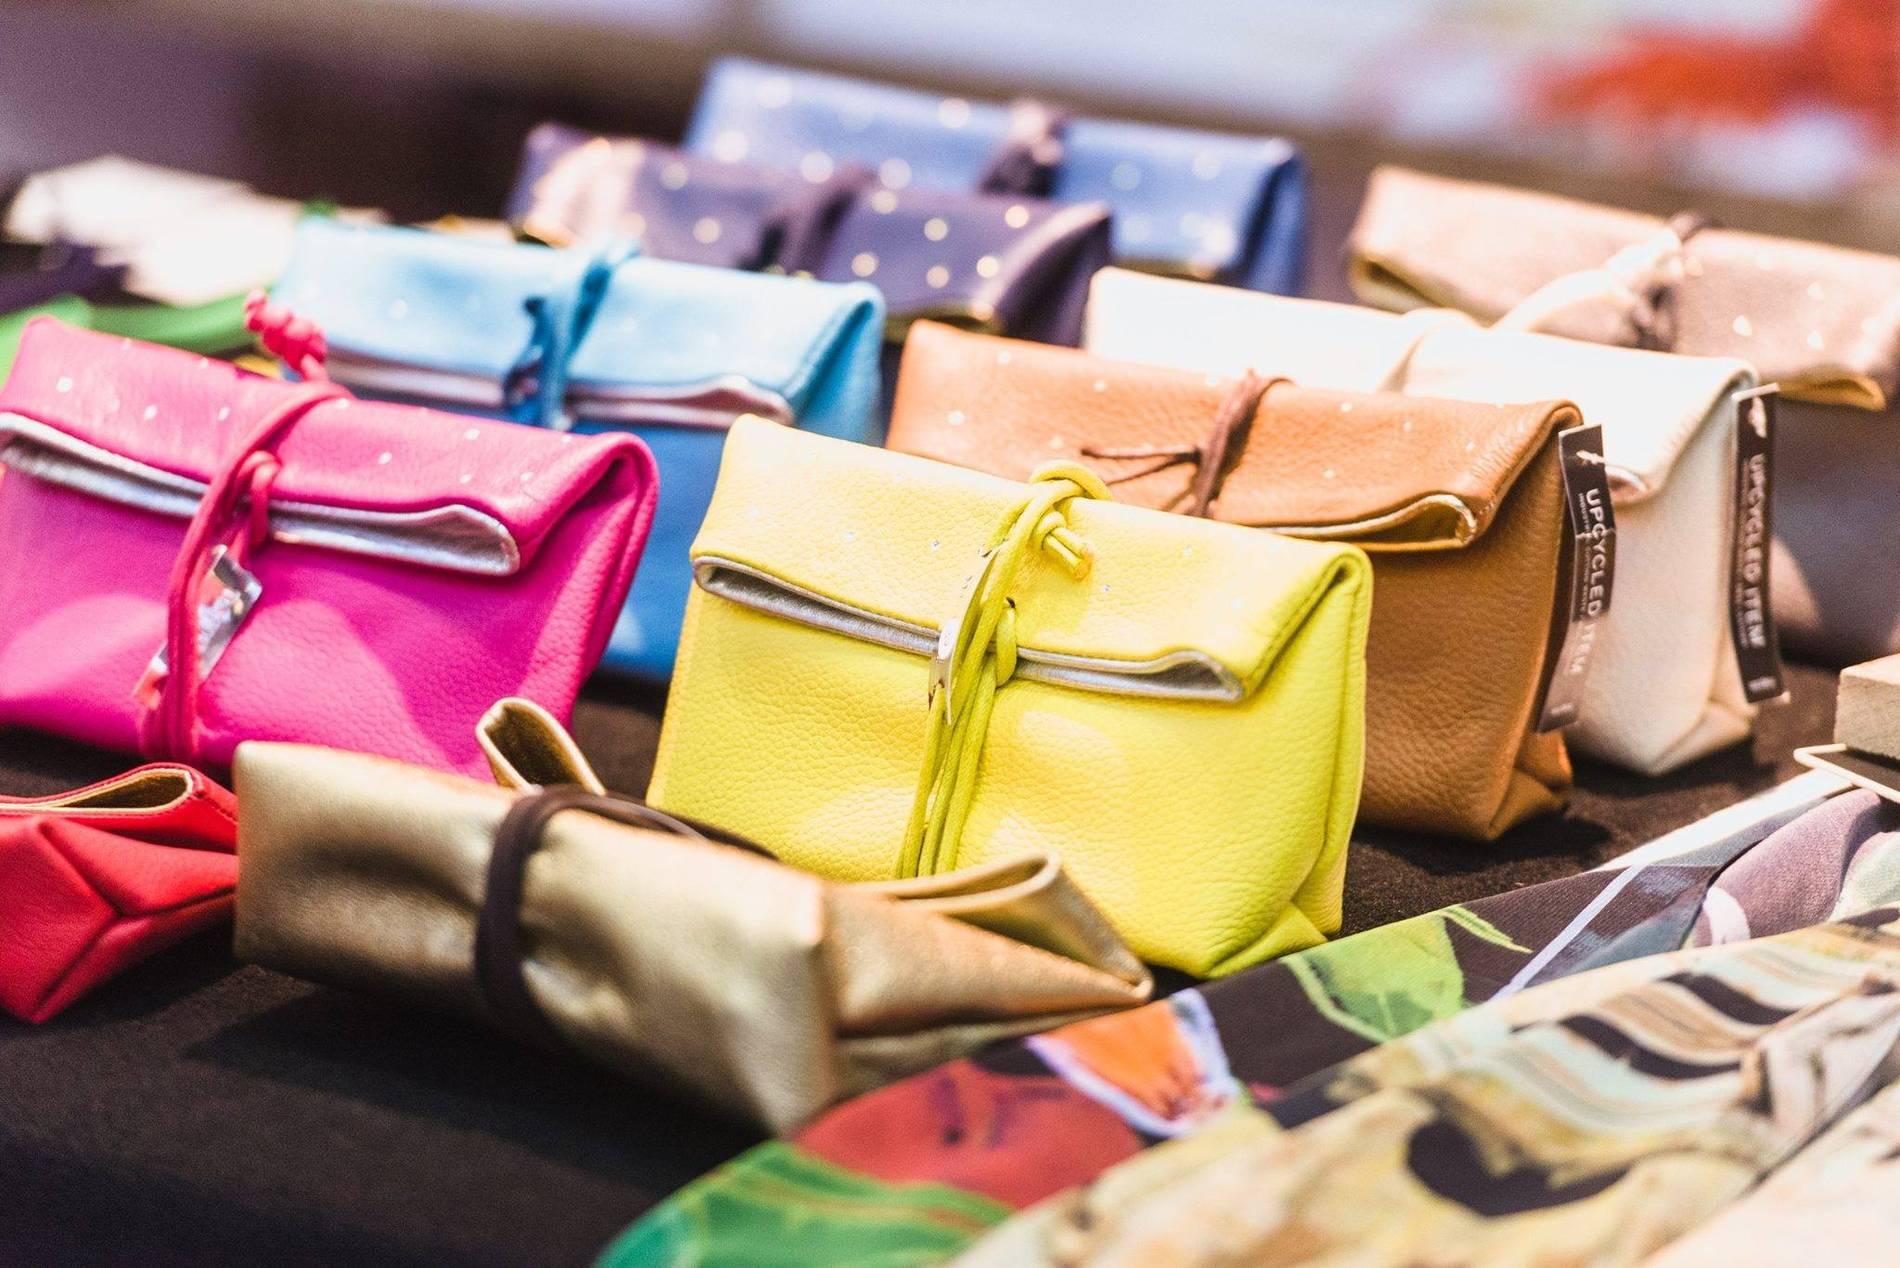 Estonian design clutchbags